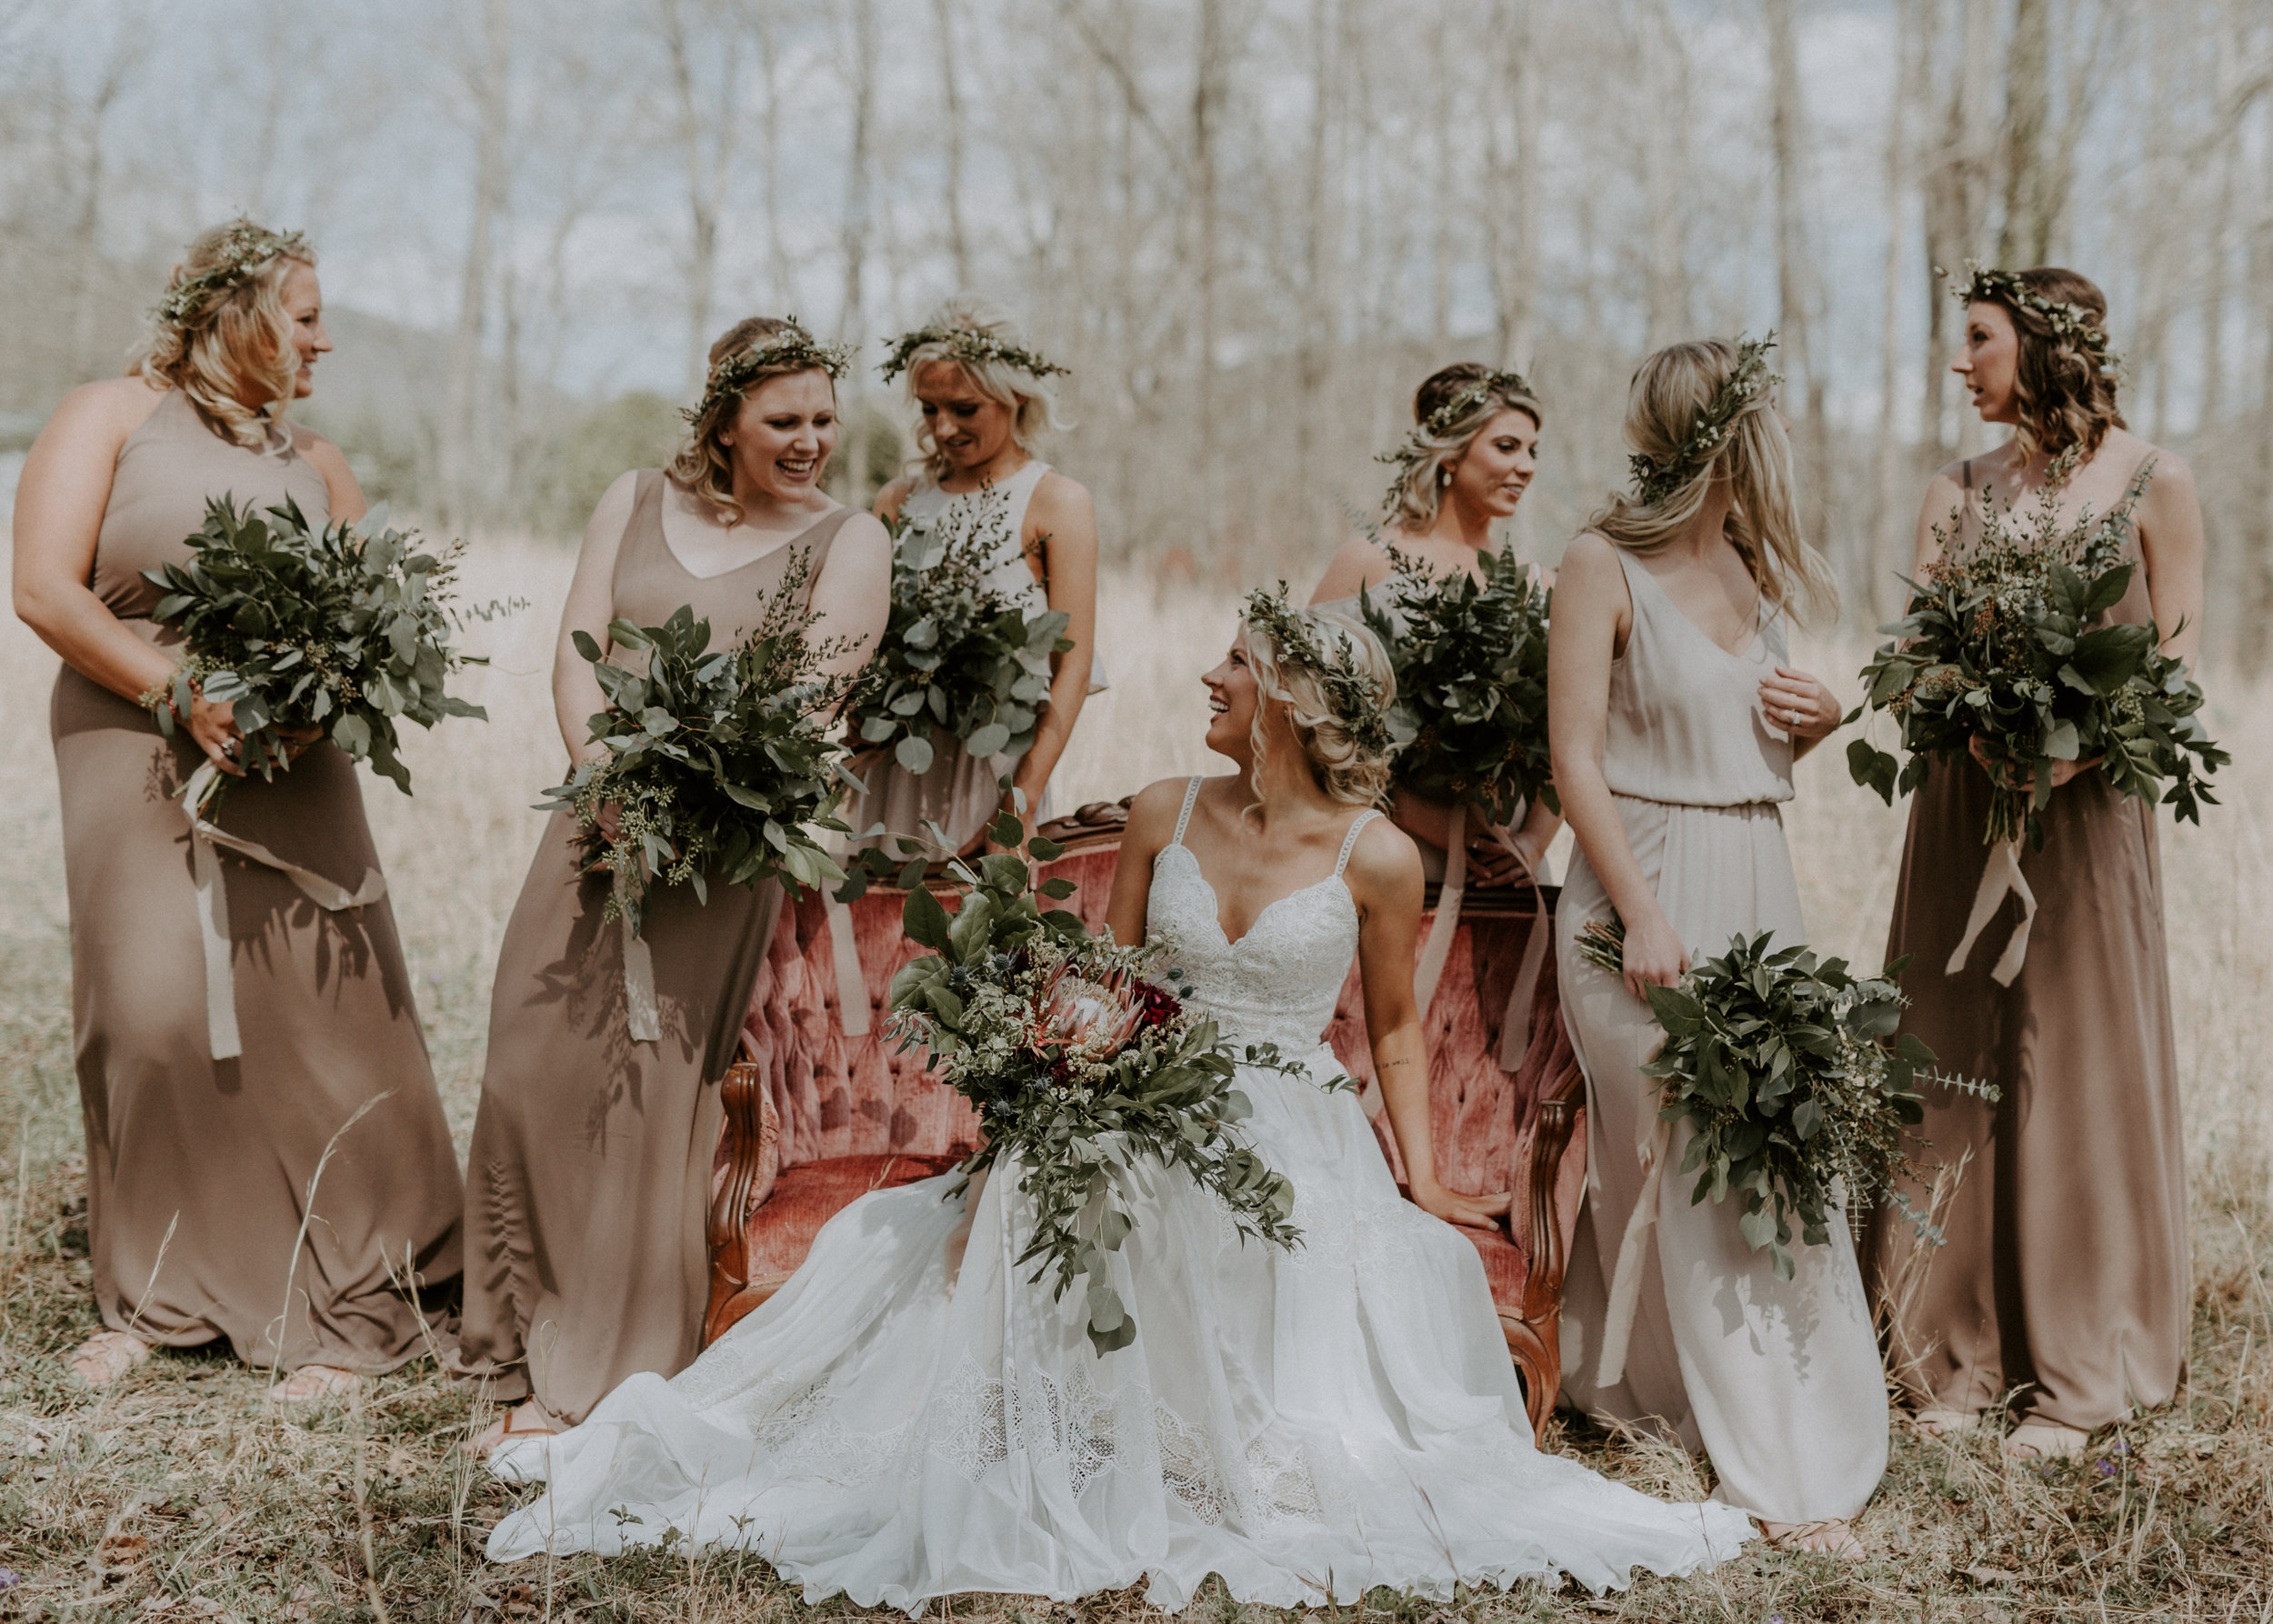 North Georgia Wedding Venue Boho Wedding.jpg